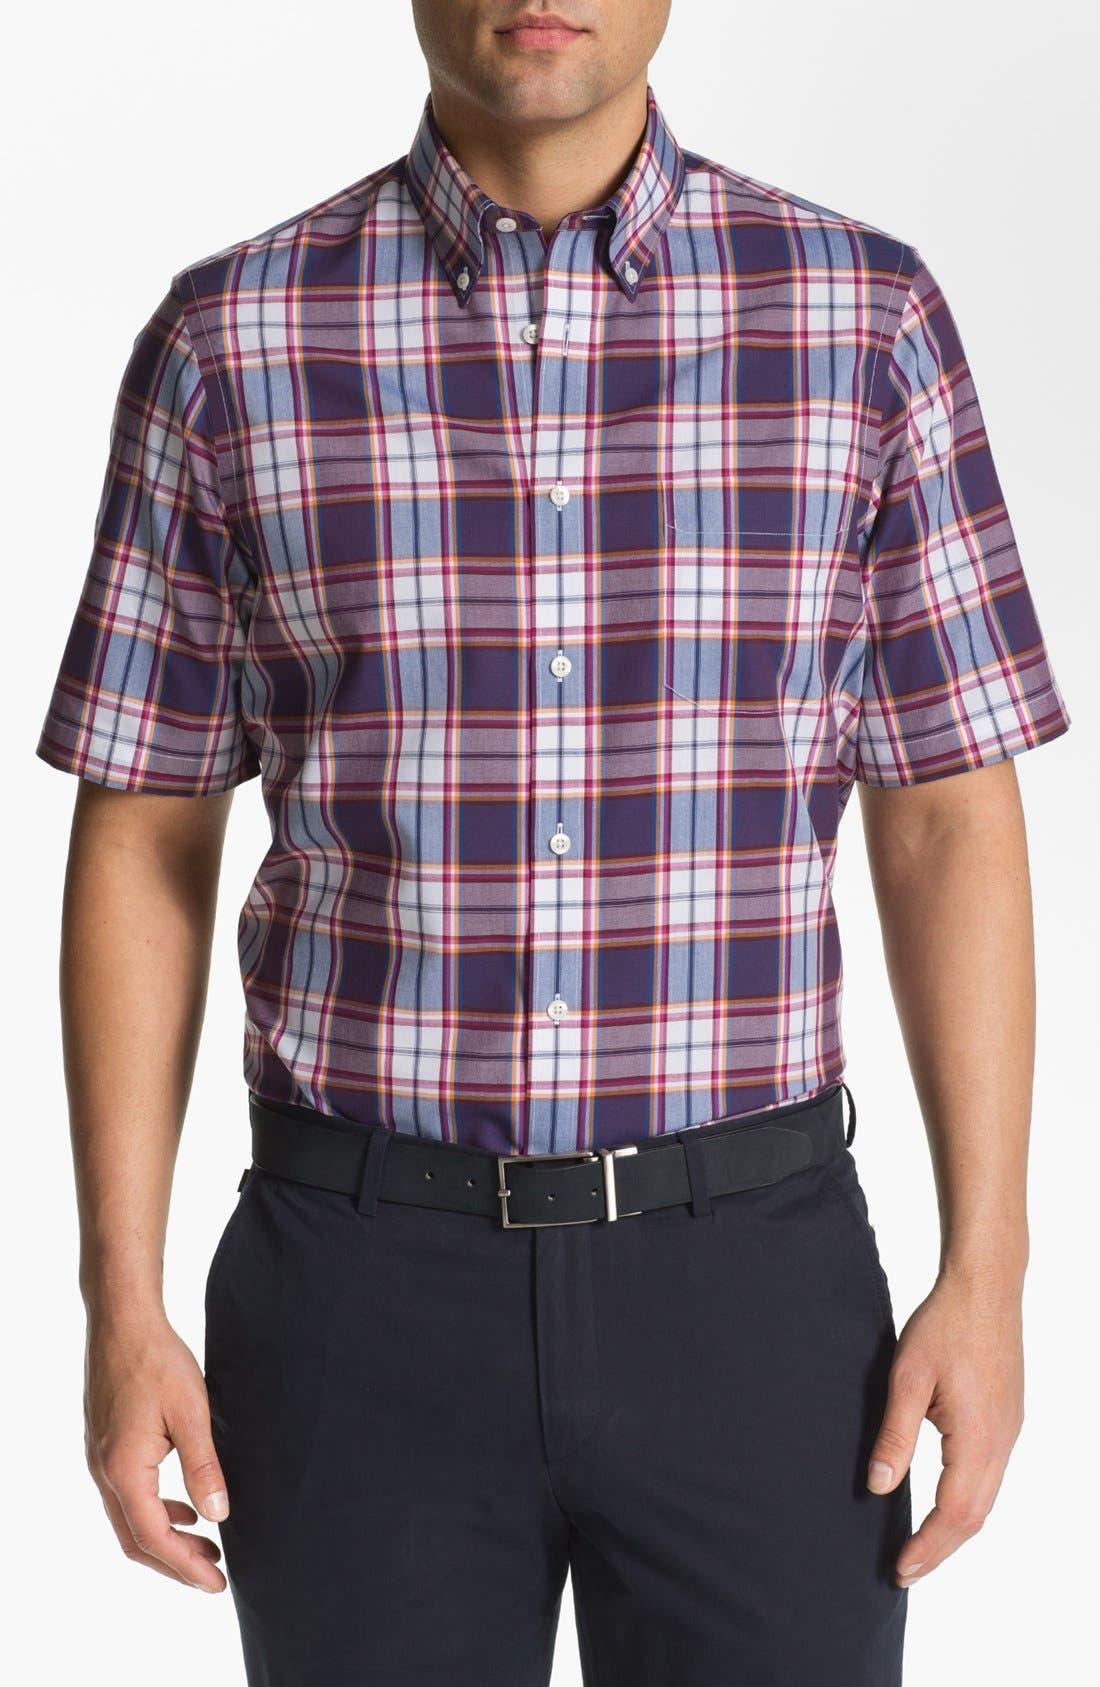 Alternate Image 1 Selected - Nordstrom Short Sleeve Poplin Sport Shirt